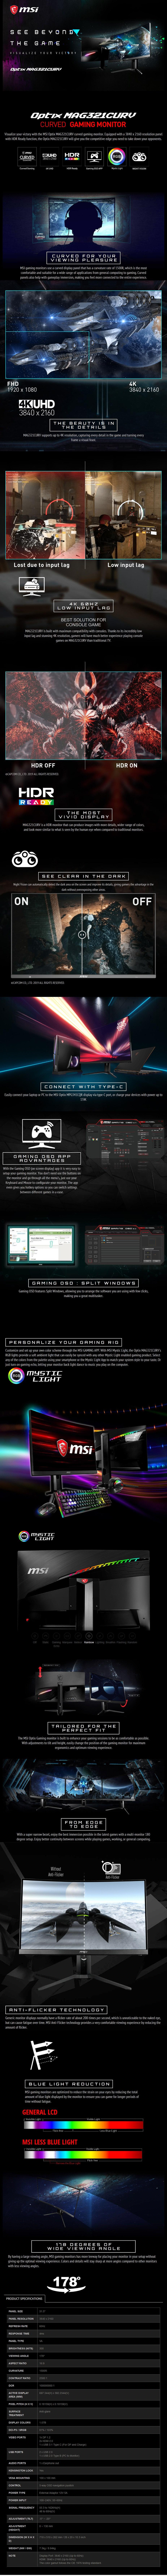 "MSI OPTIX MAG321CURV 31.5"" 4K UHD Curved VA Gaming Monitor - Overview 1"